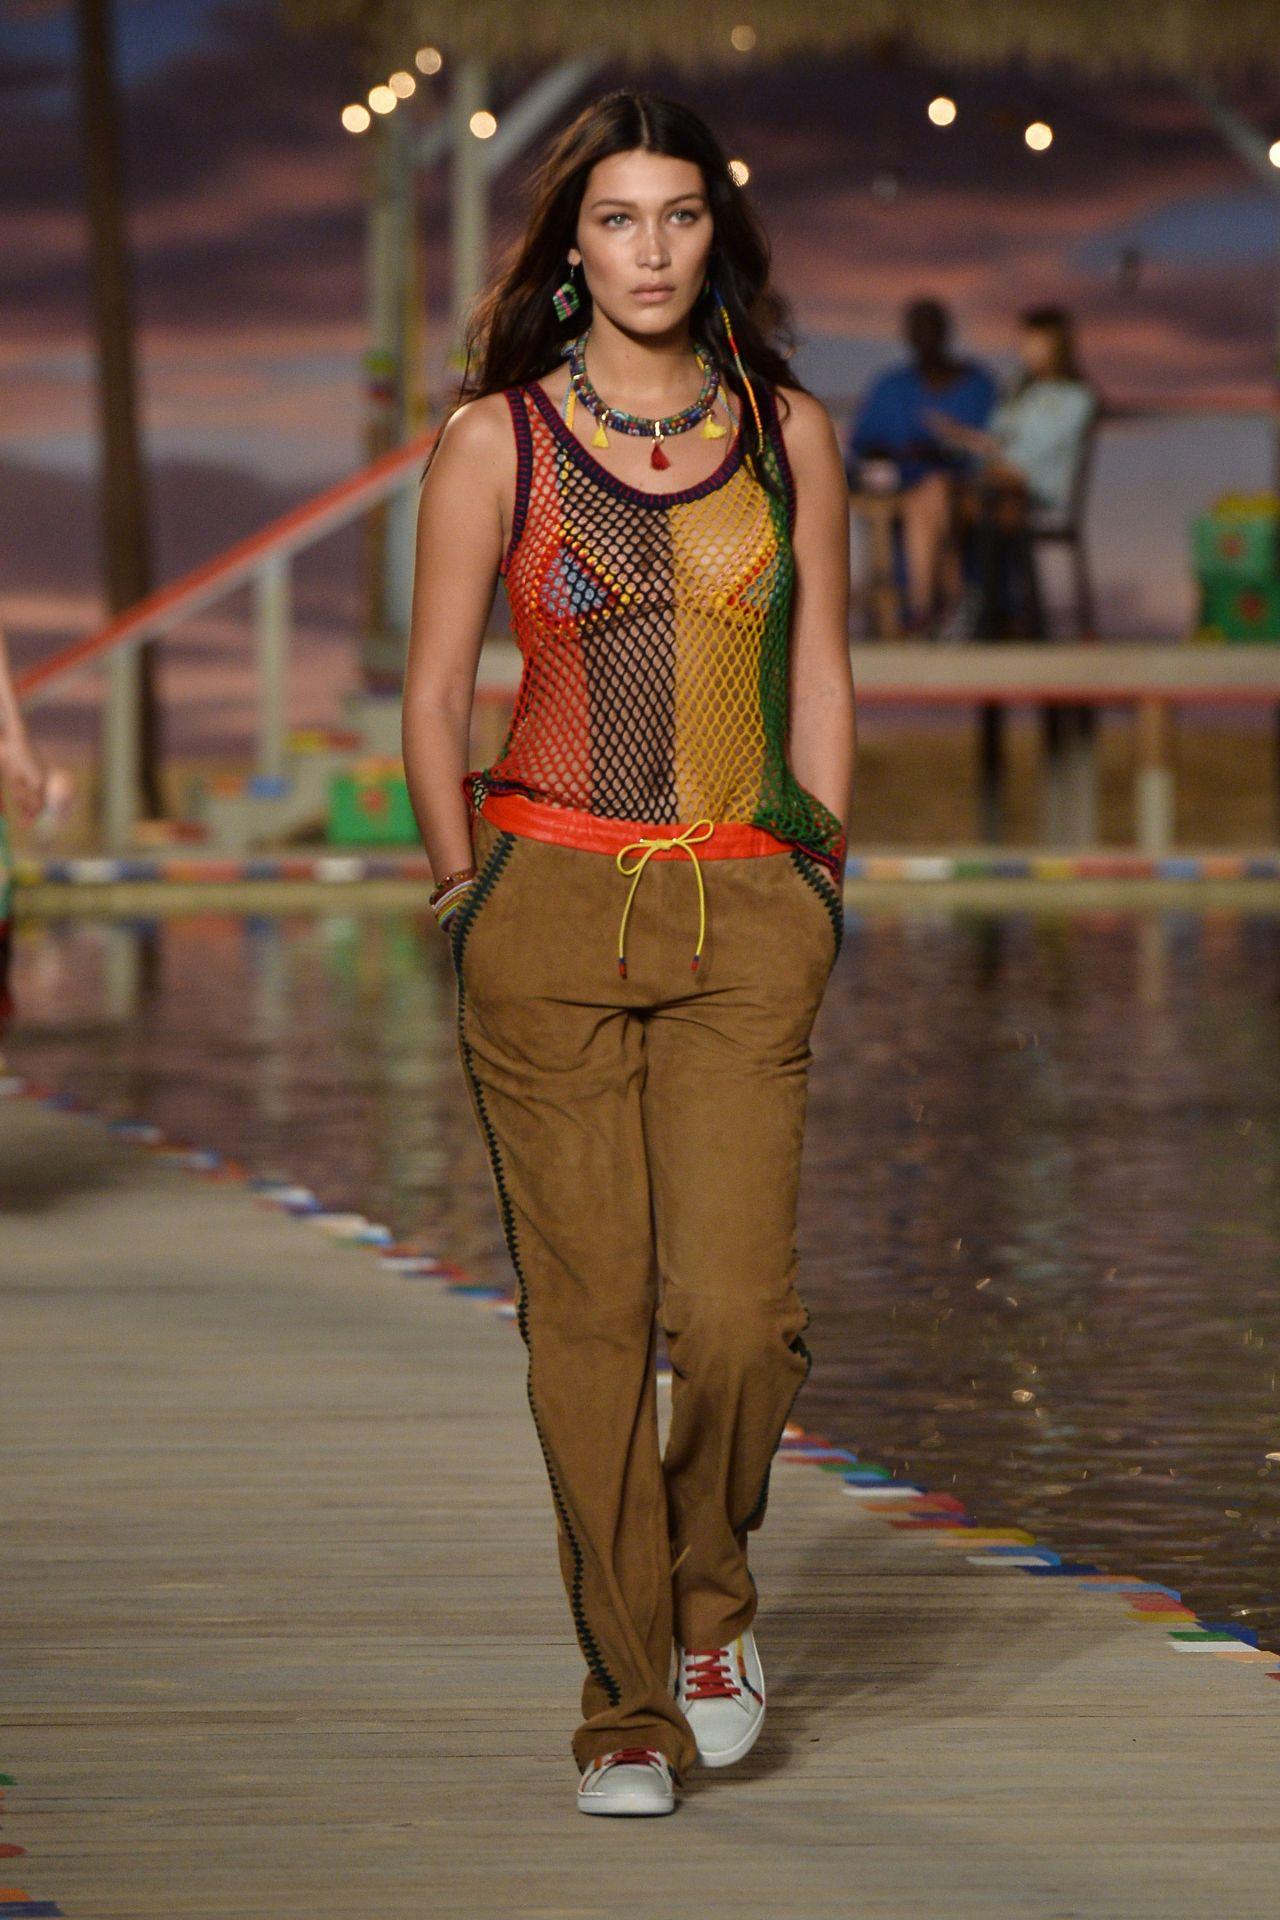 46b38a47c Bella Hadid - Tommy Hilfiger Runway Show - New York Fashion Week, September  2015